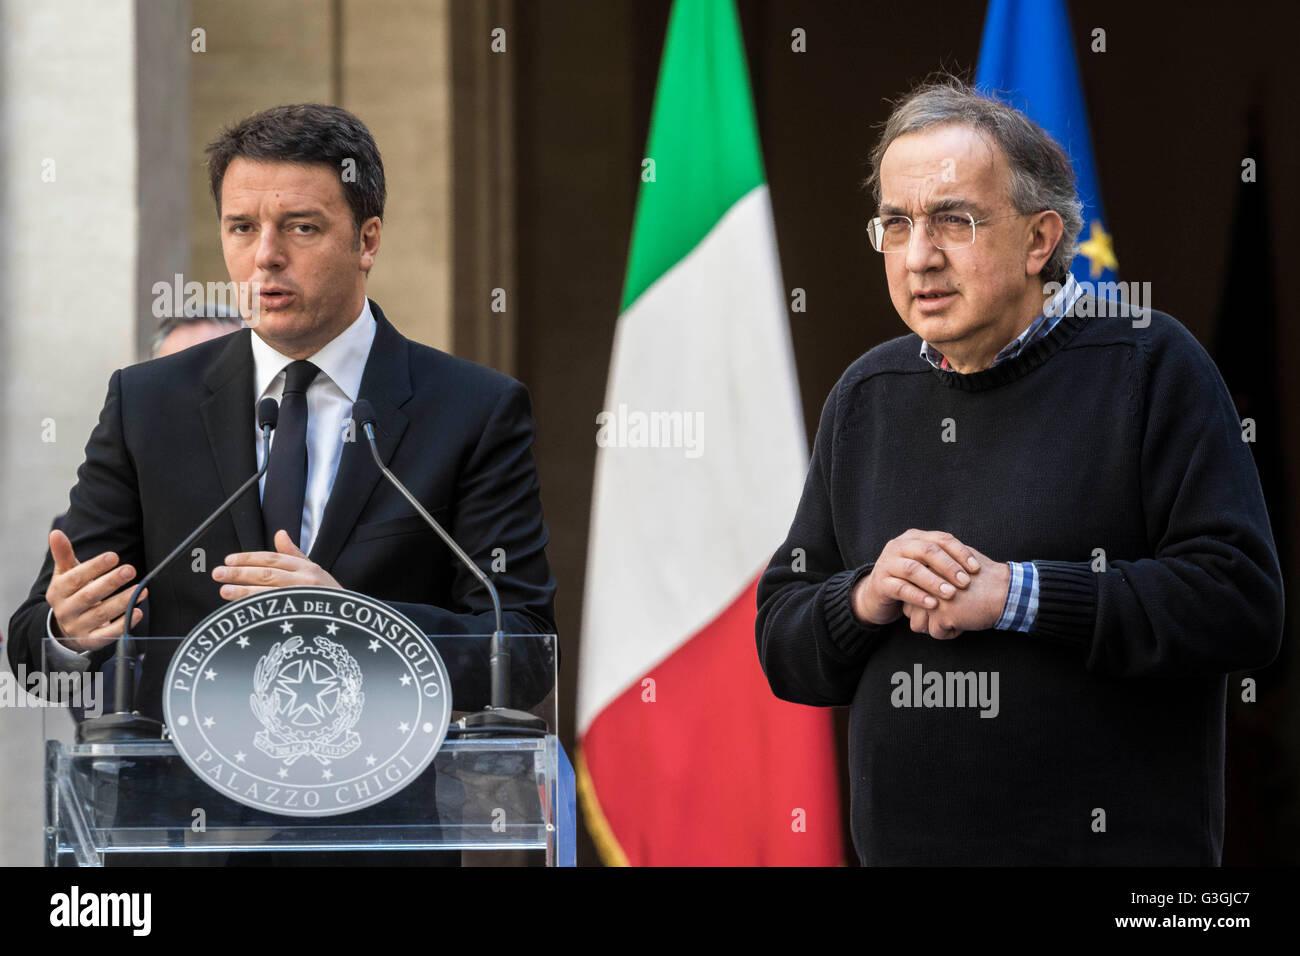 Italian Prime Minister Matteo Renzi (L) and Sergio Marchionne (R), CEO of Fiat Chrysler Automobiles (FCA) attend Stock Photo